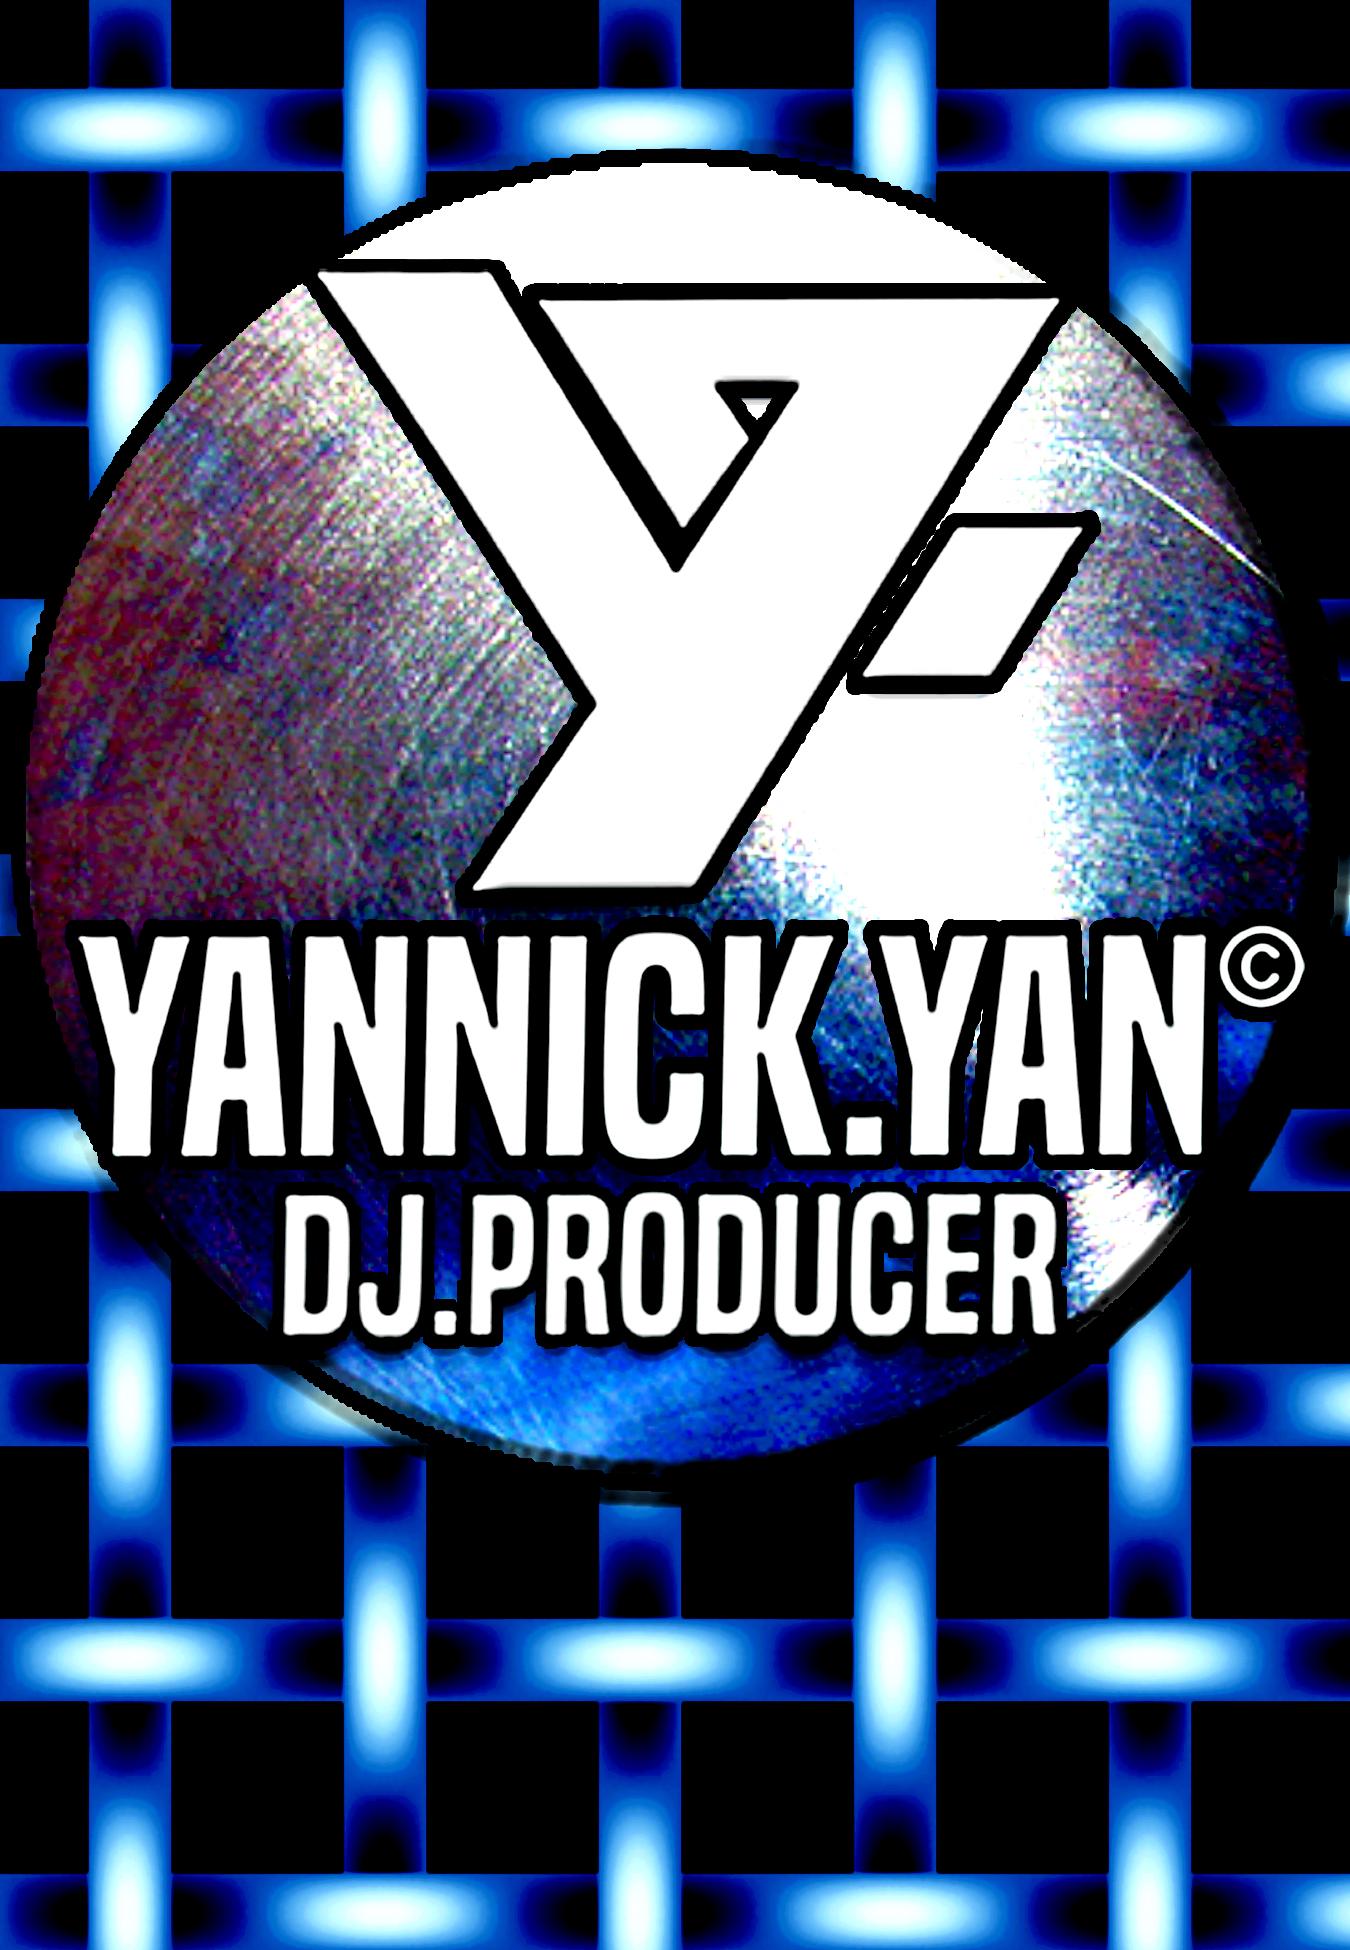 http://panoramix-radio-station.com/wp-content/uploads/2016/12/YY-logo-2017.jpg